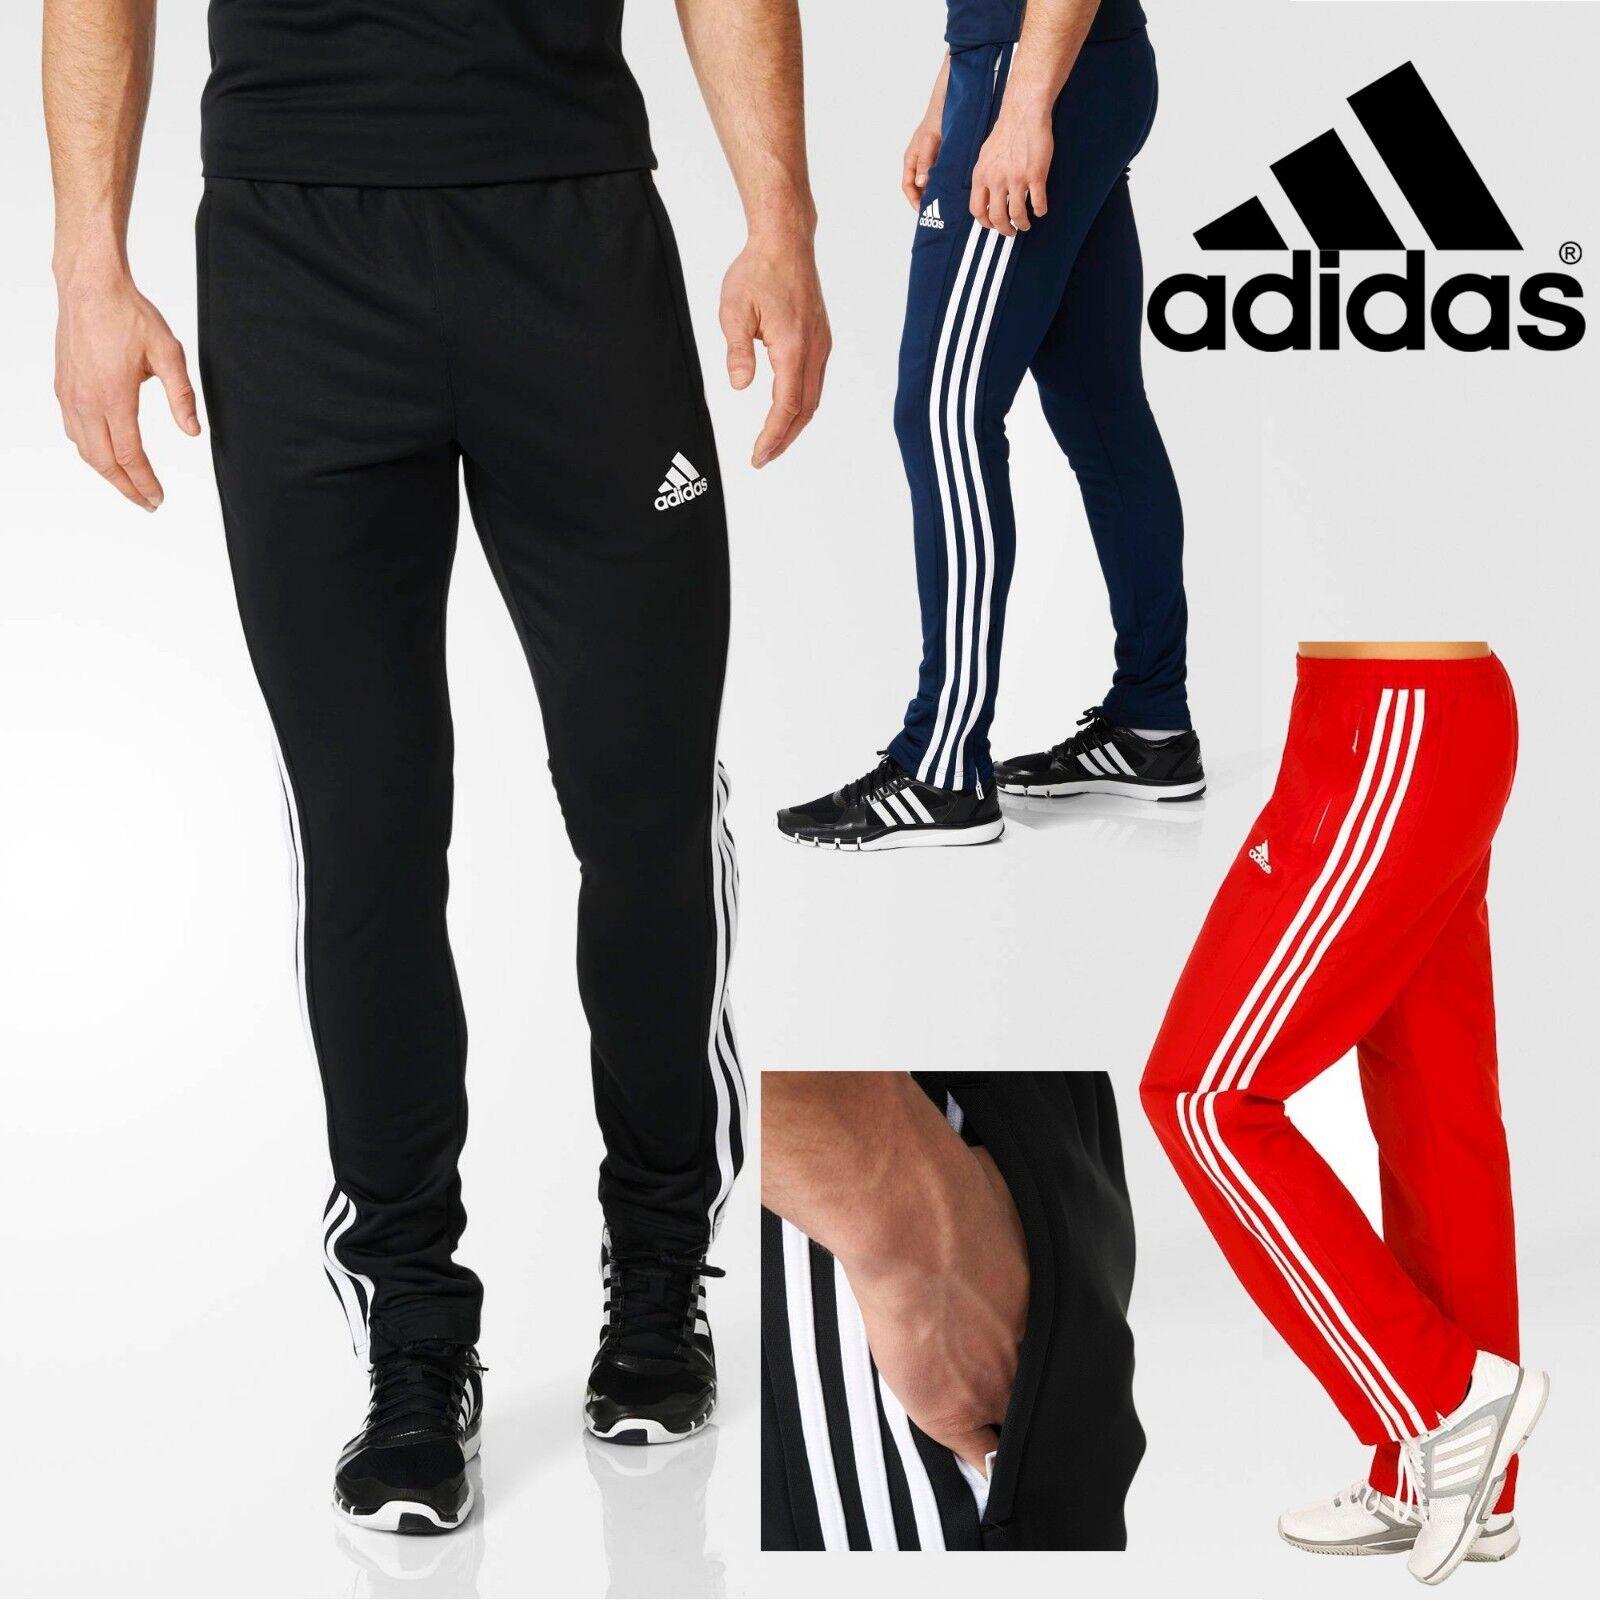 adidas Mens T16 CLIMALITE Sweat Pants Αθλητικά ΓυμναστΞ�ρια ΓυμναστΞ�ρια